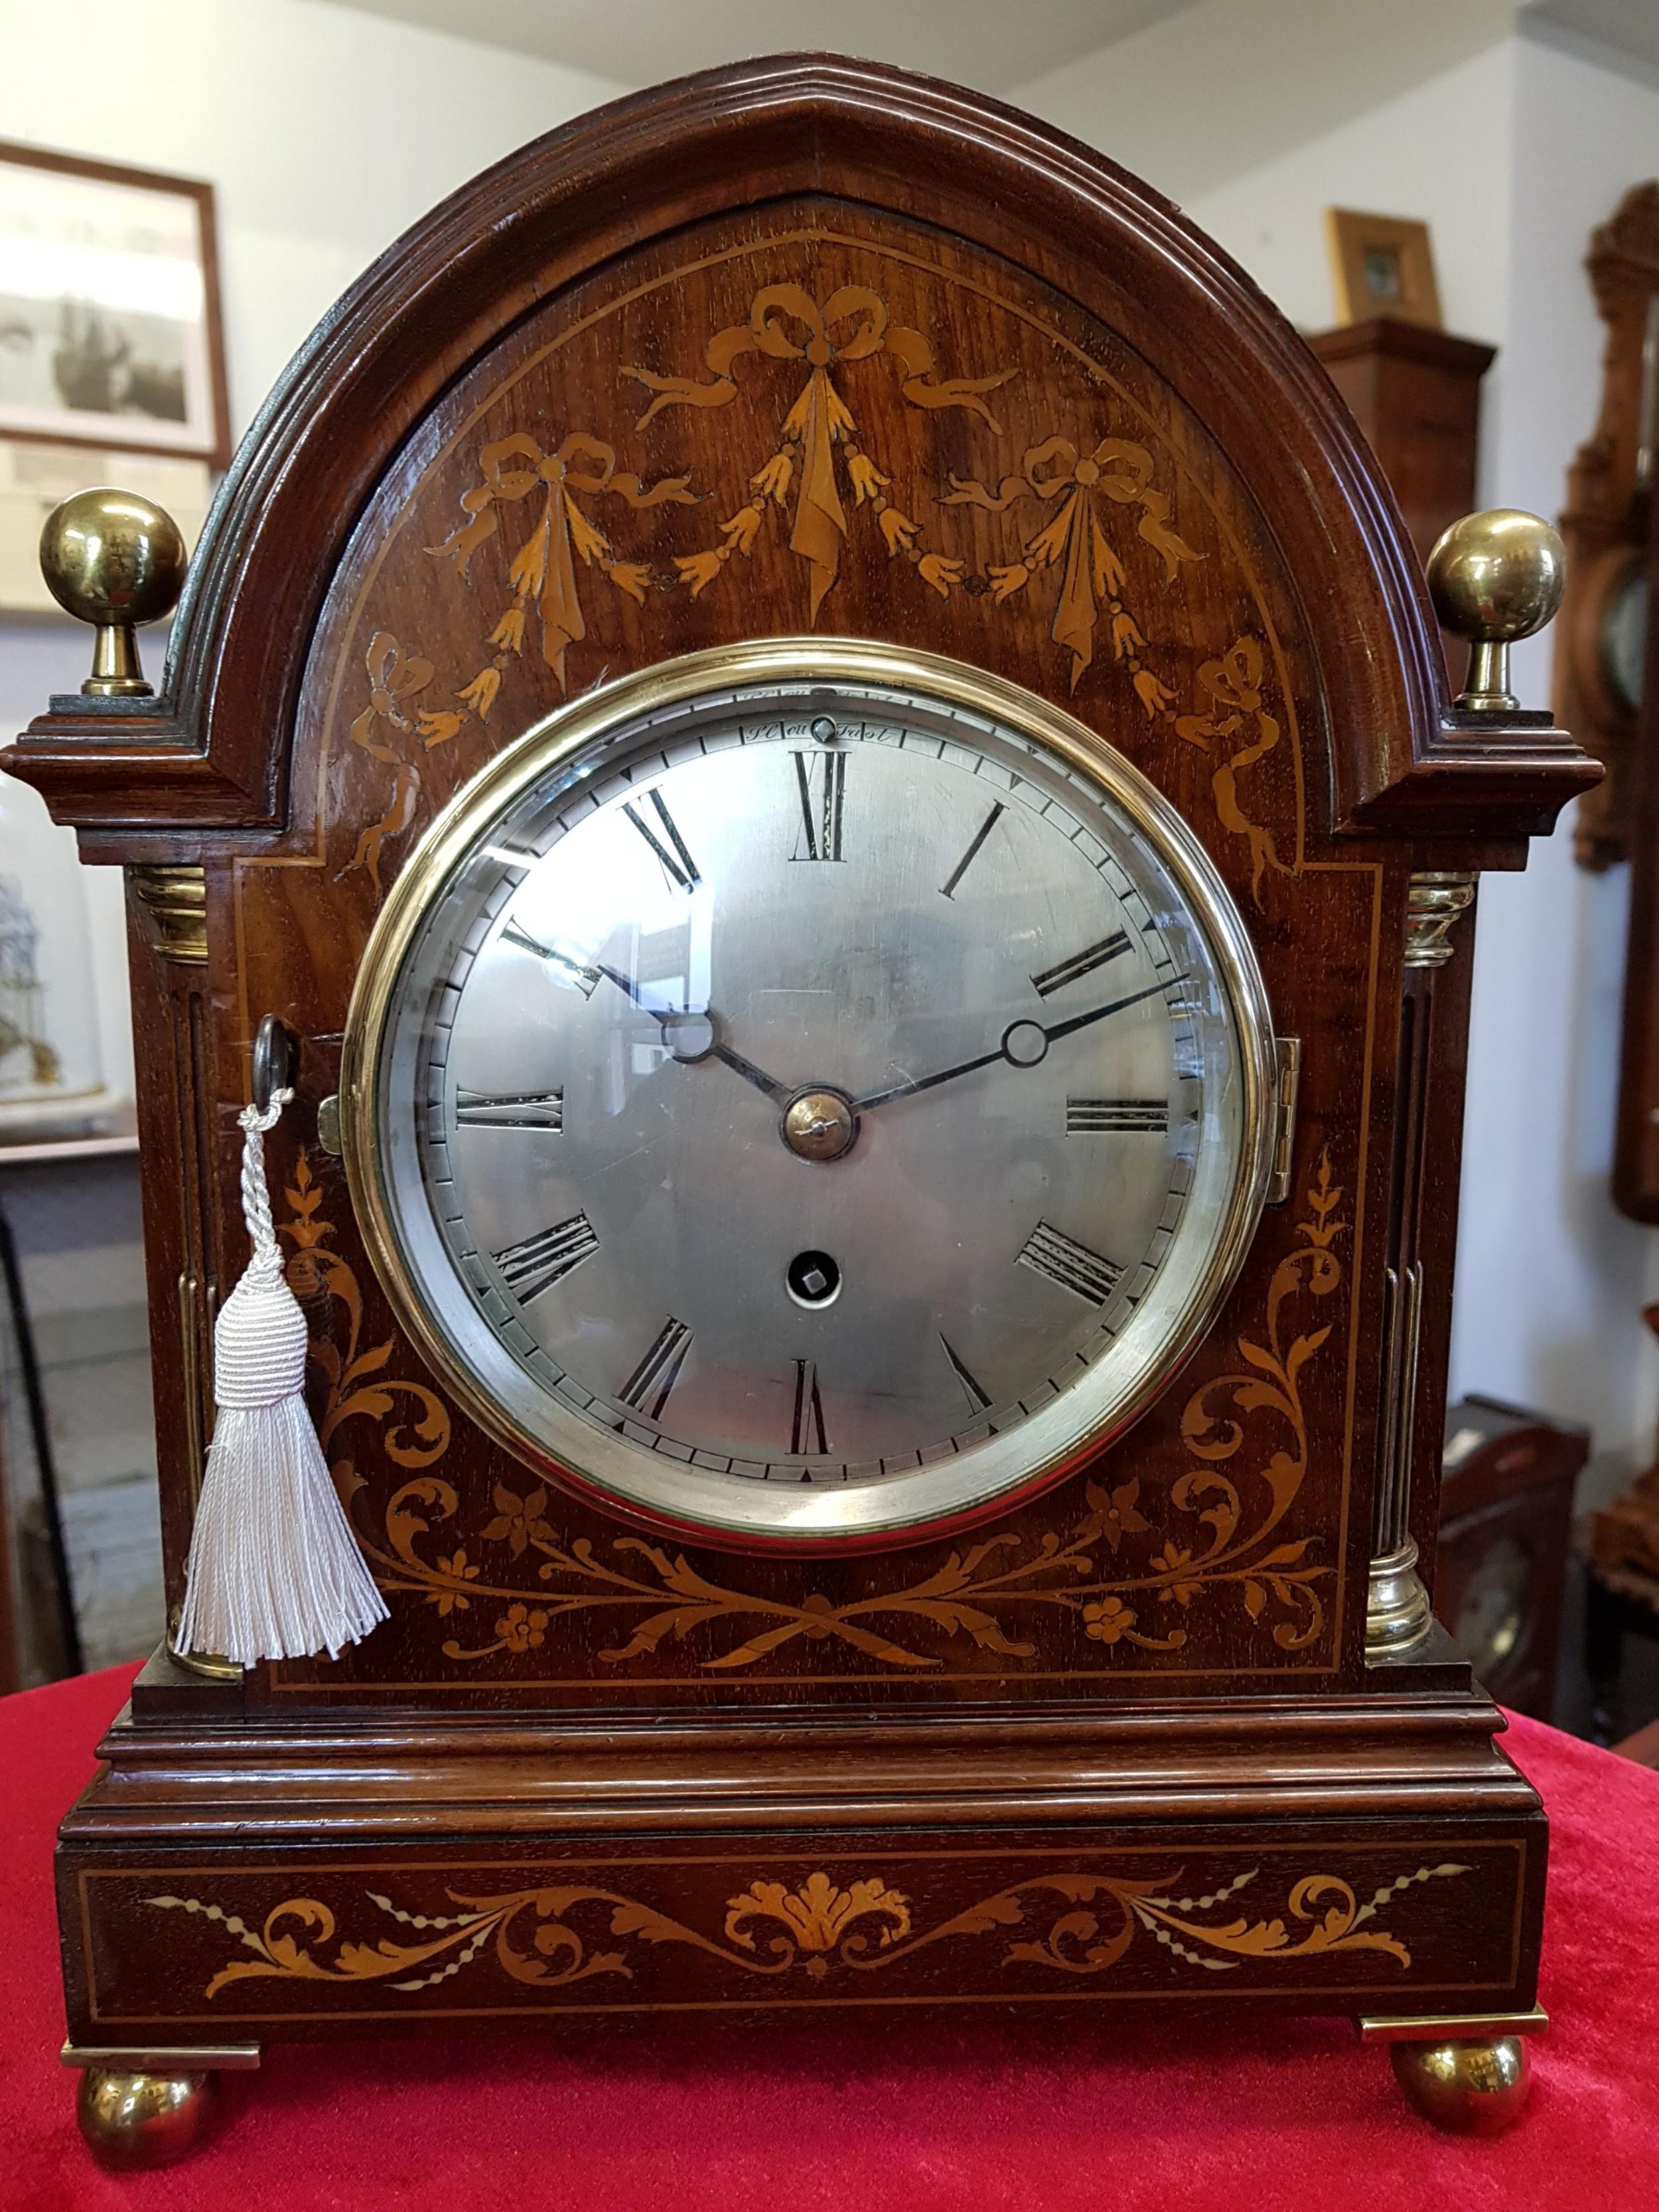 a silent escapement good inlaid bracket clock